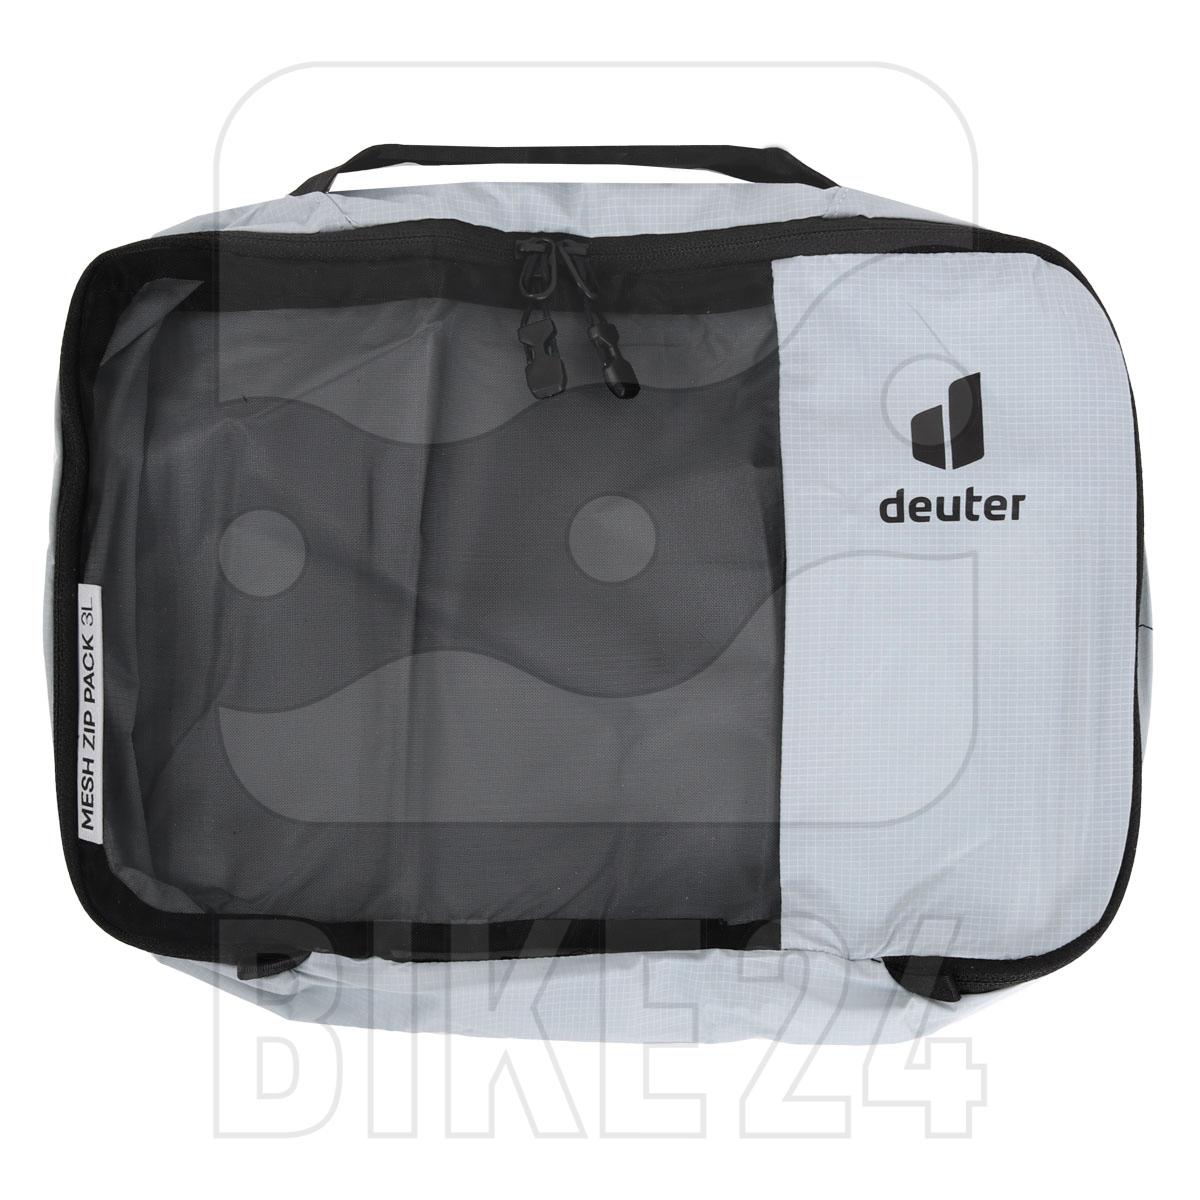 Image of Deuter Mesh Zip Pack 3 liters - tin-black